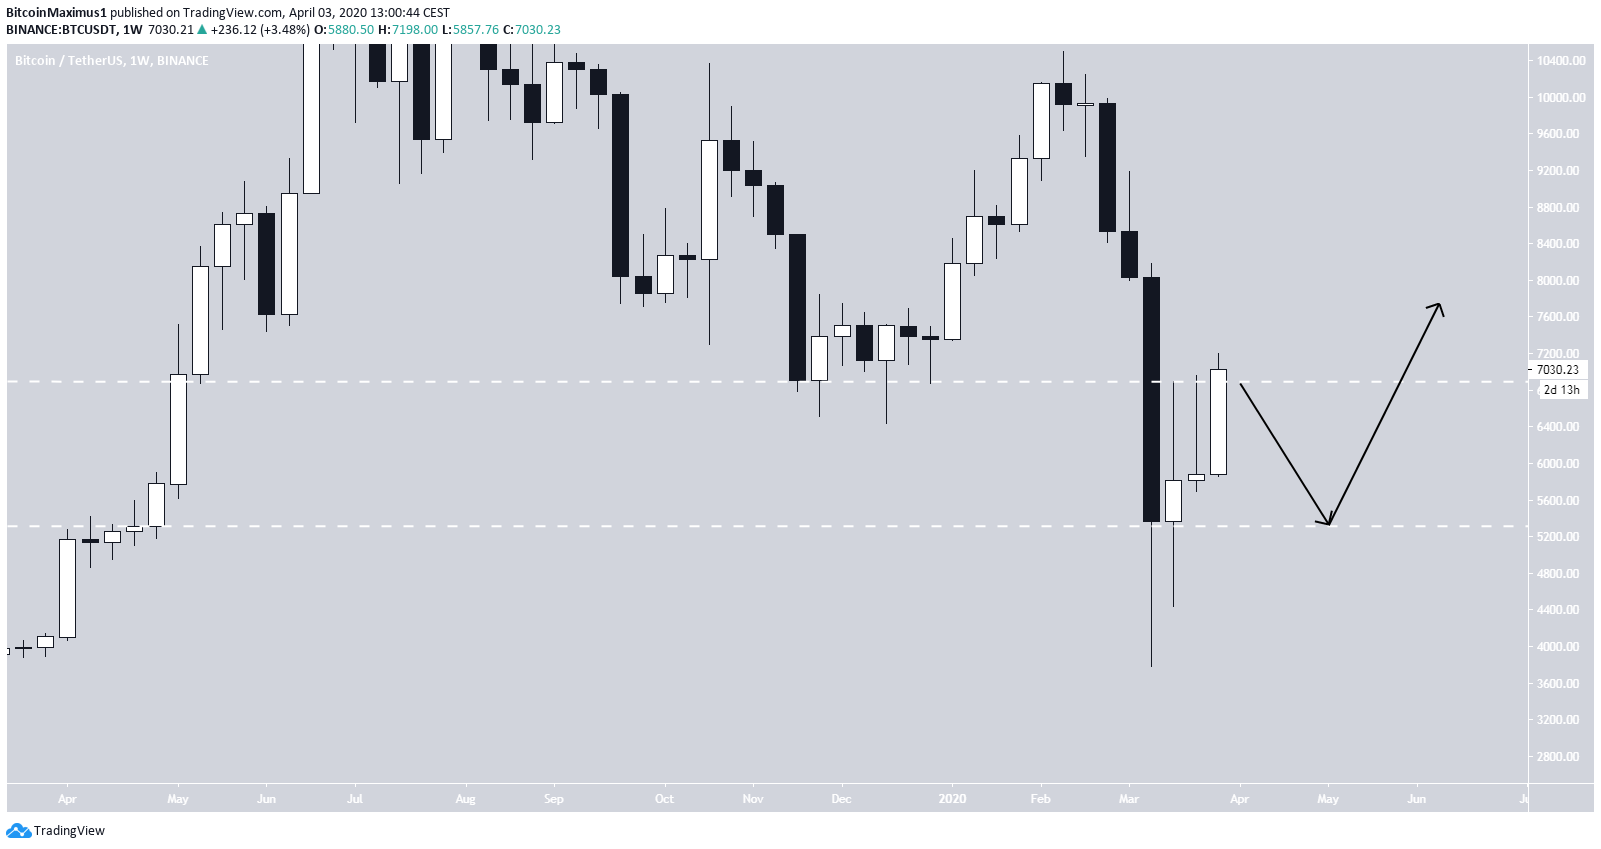 Bitcoin High Time-Frame Fractal